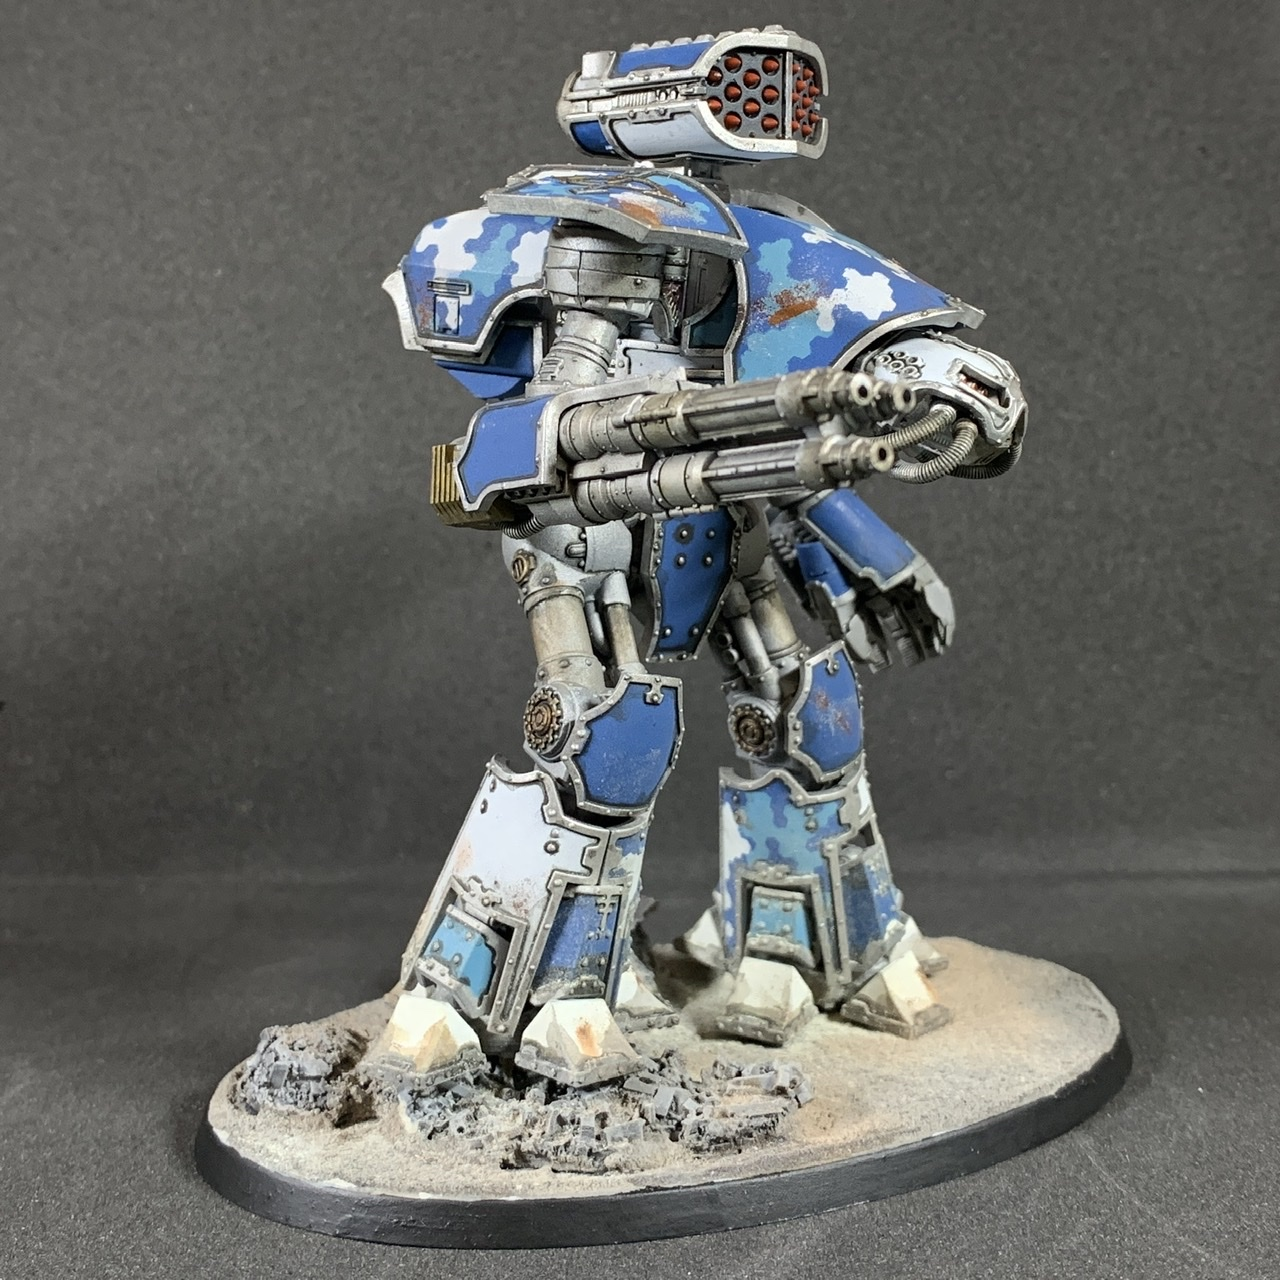 Reaver Titan. Credit: Pvt_Snafu